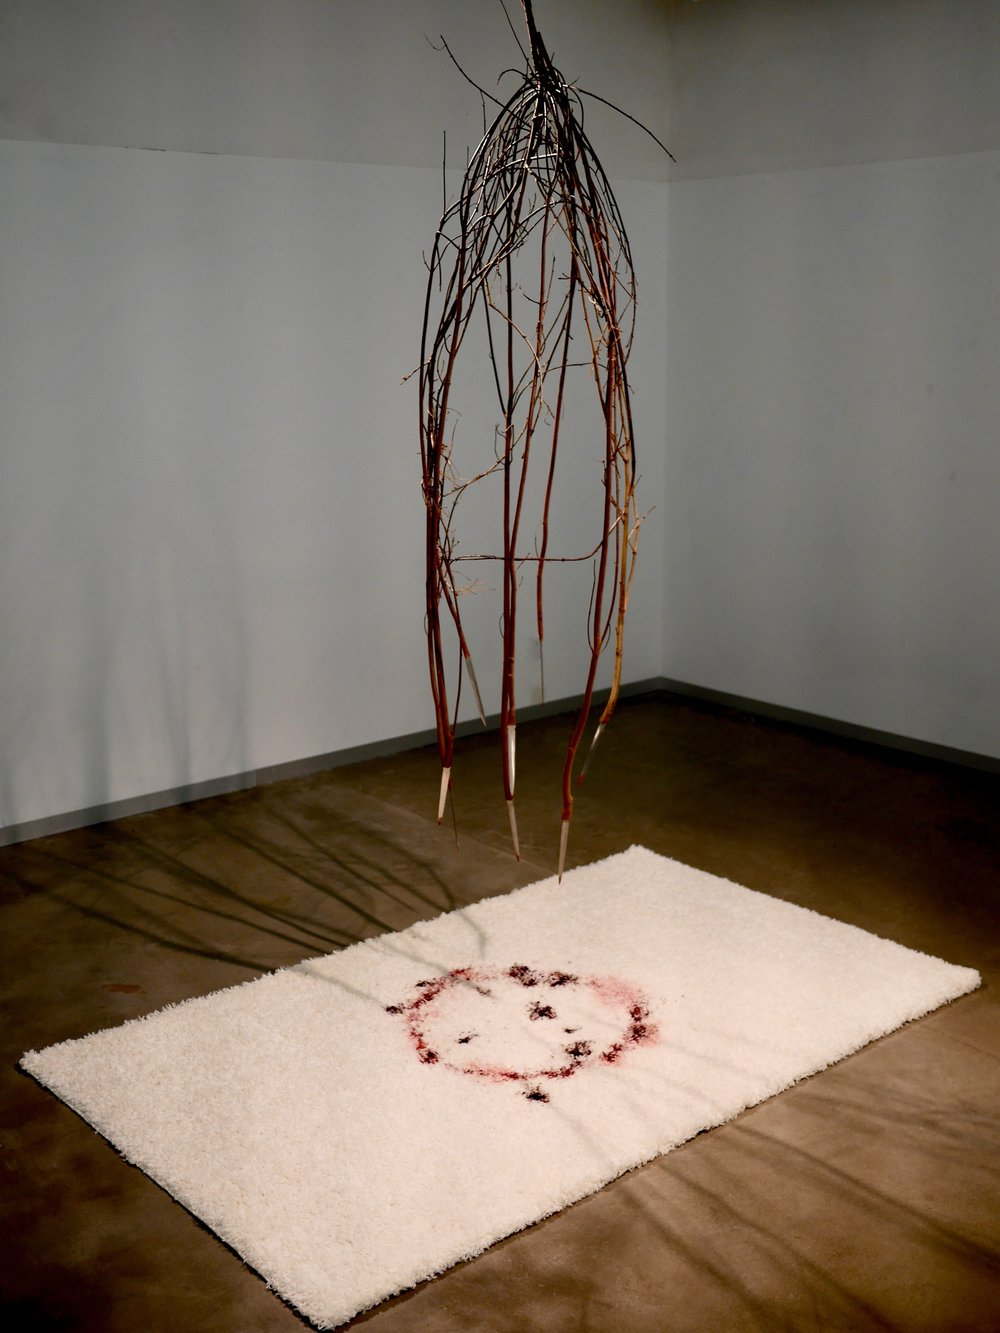 "Sapling Revolt   126"" x 72"" x 48""  Manipulated found wood, dagger blanks, white shag carpet, dye, acrylic paint  (2018)"